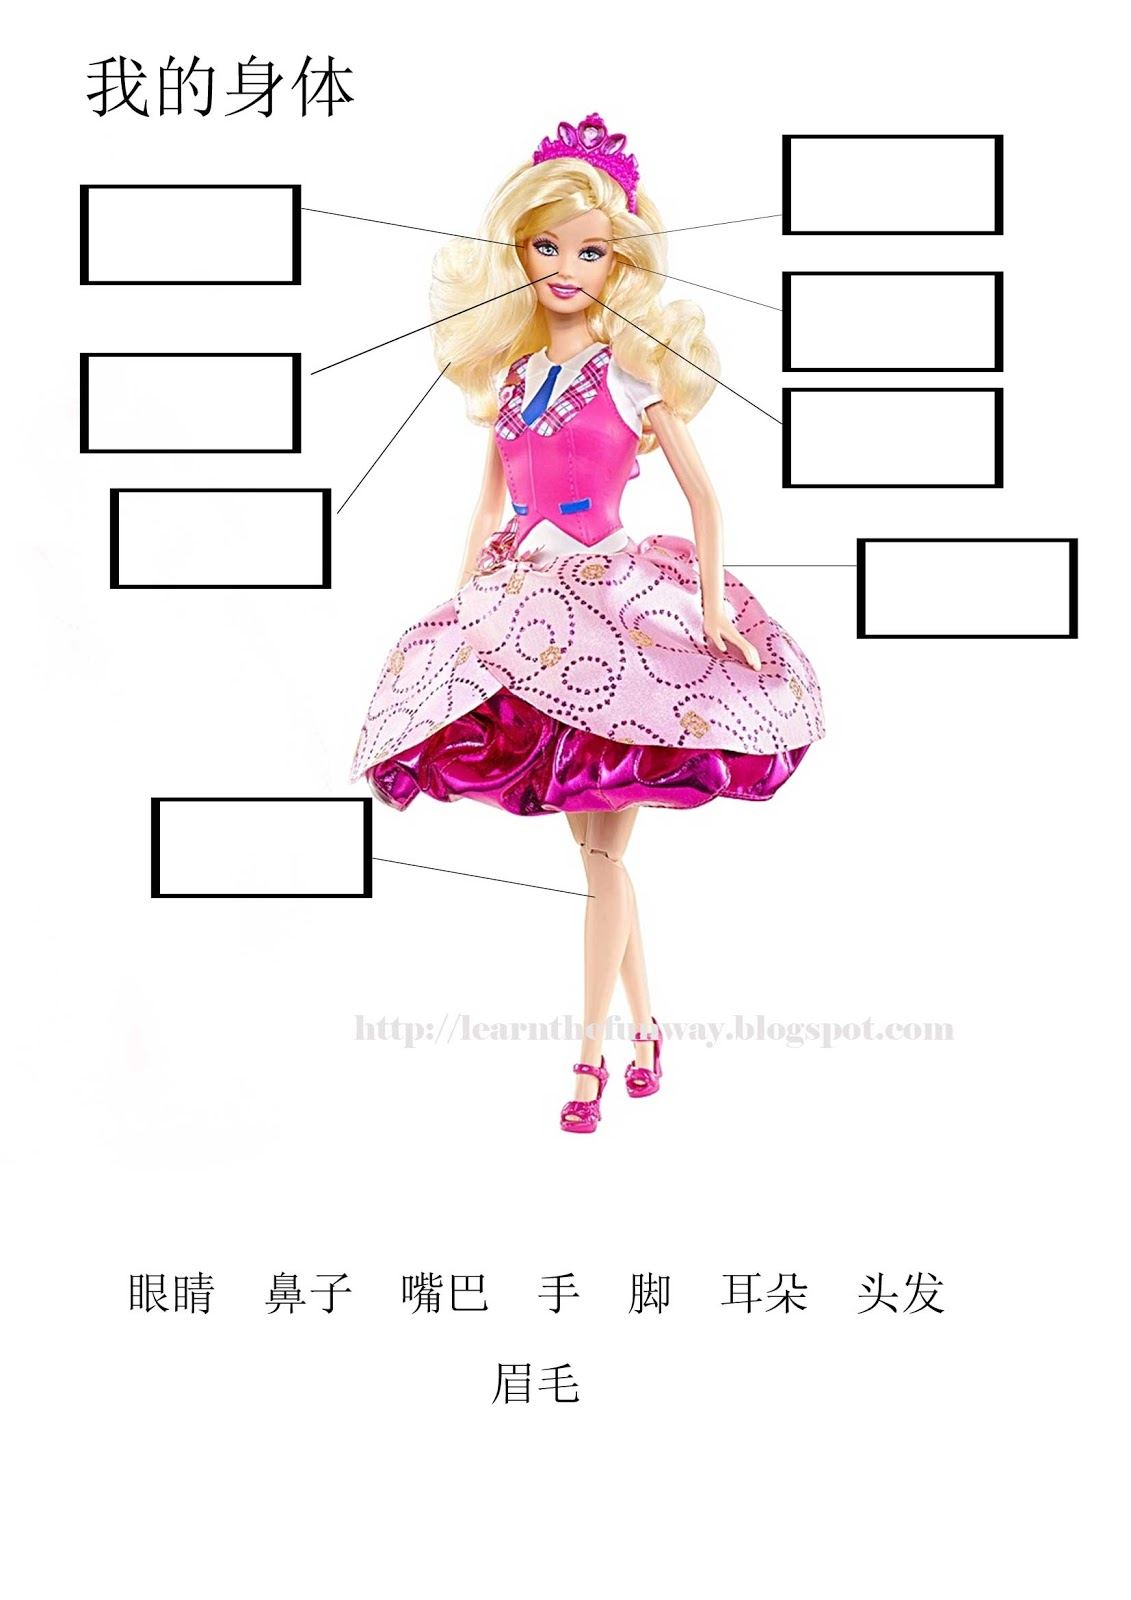 Chinese Fun Class  Lesson On Body 我的身体